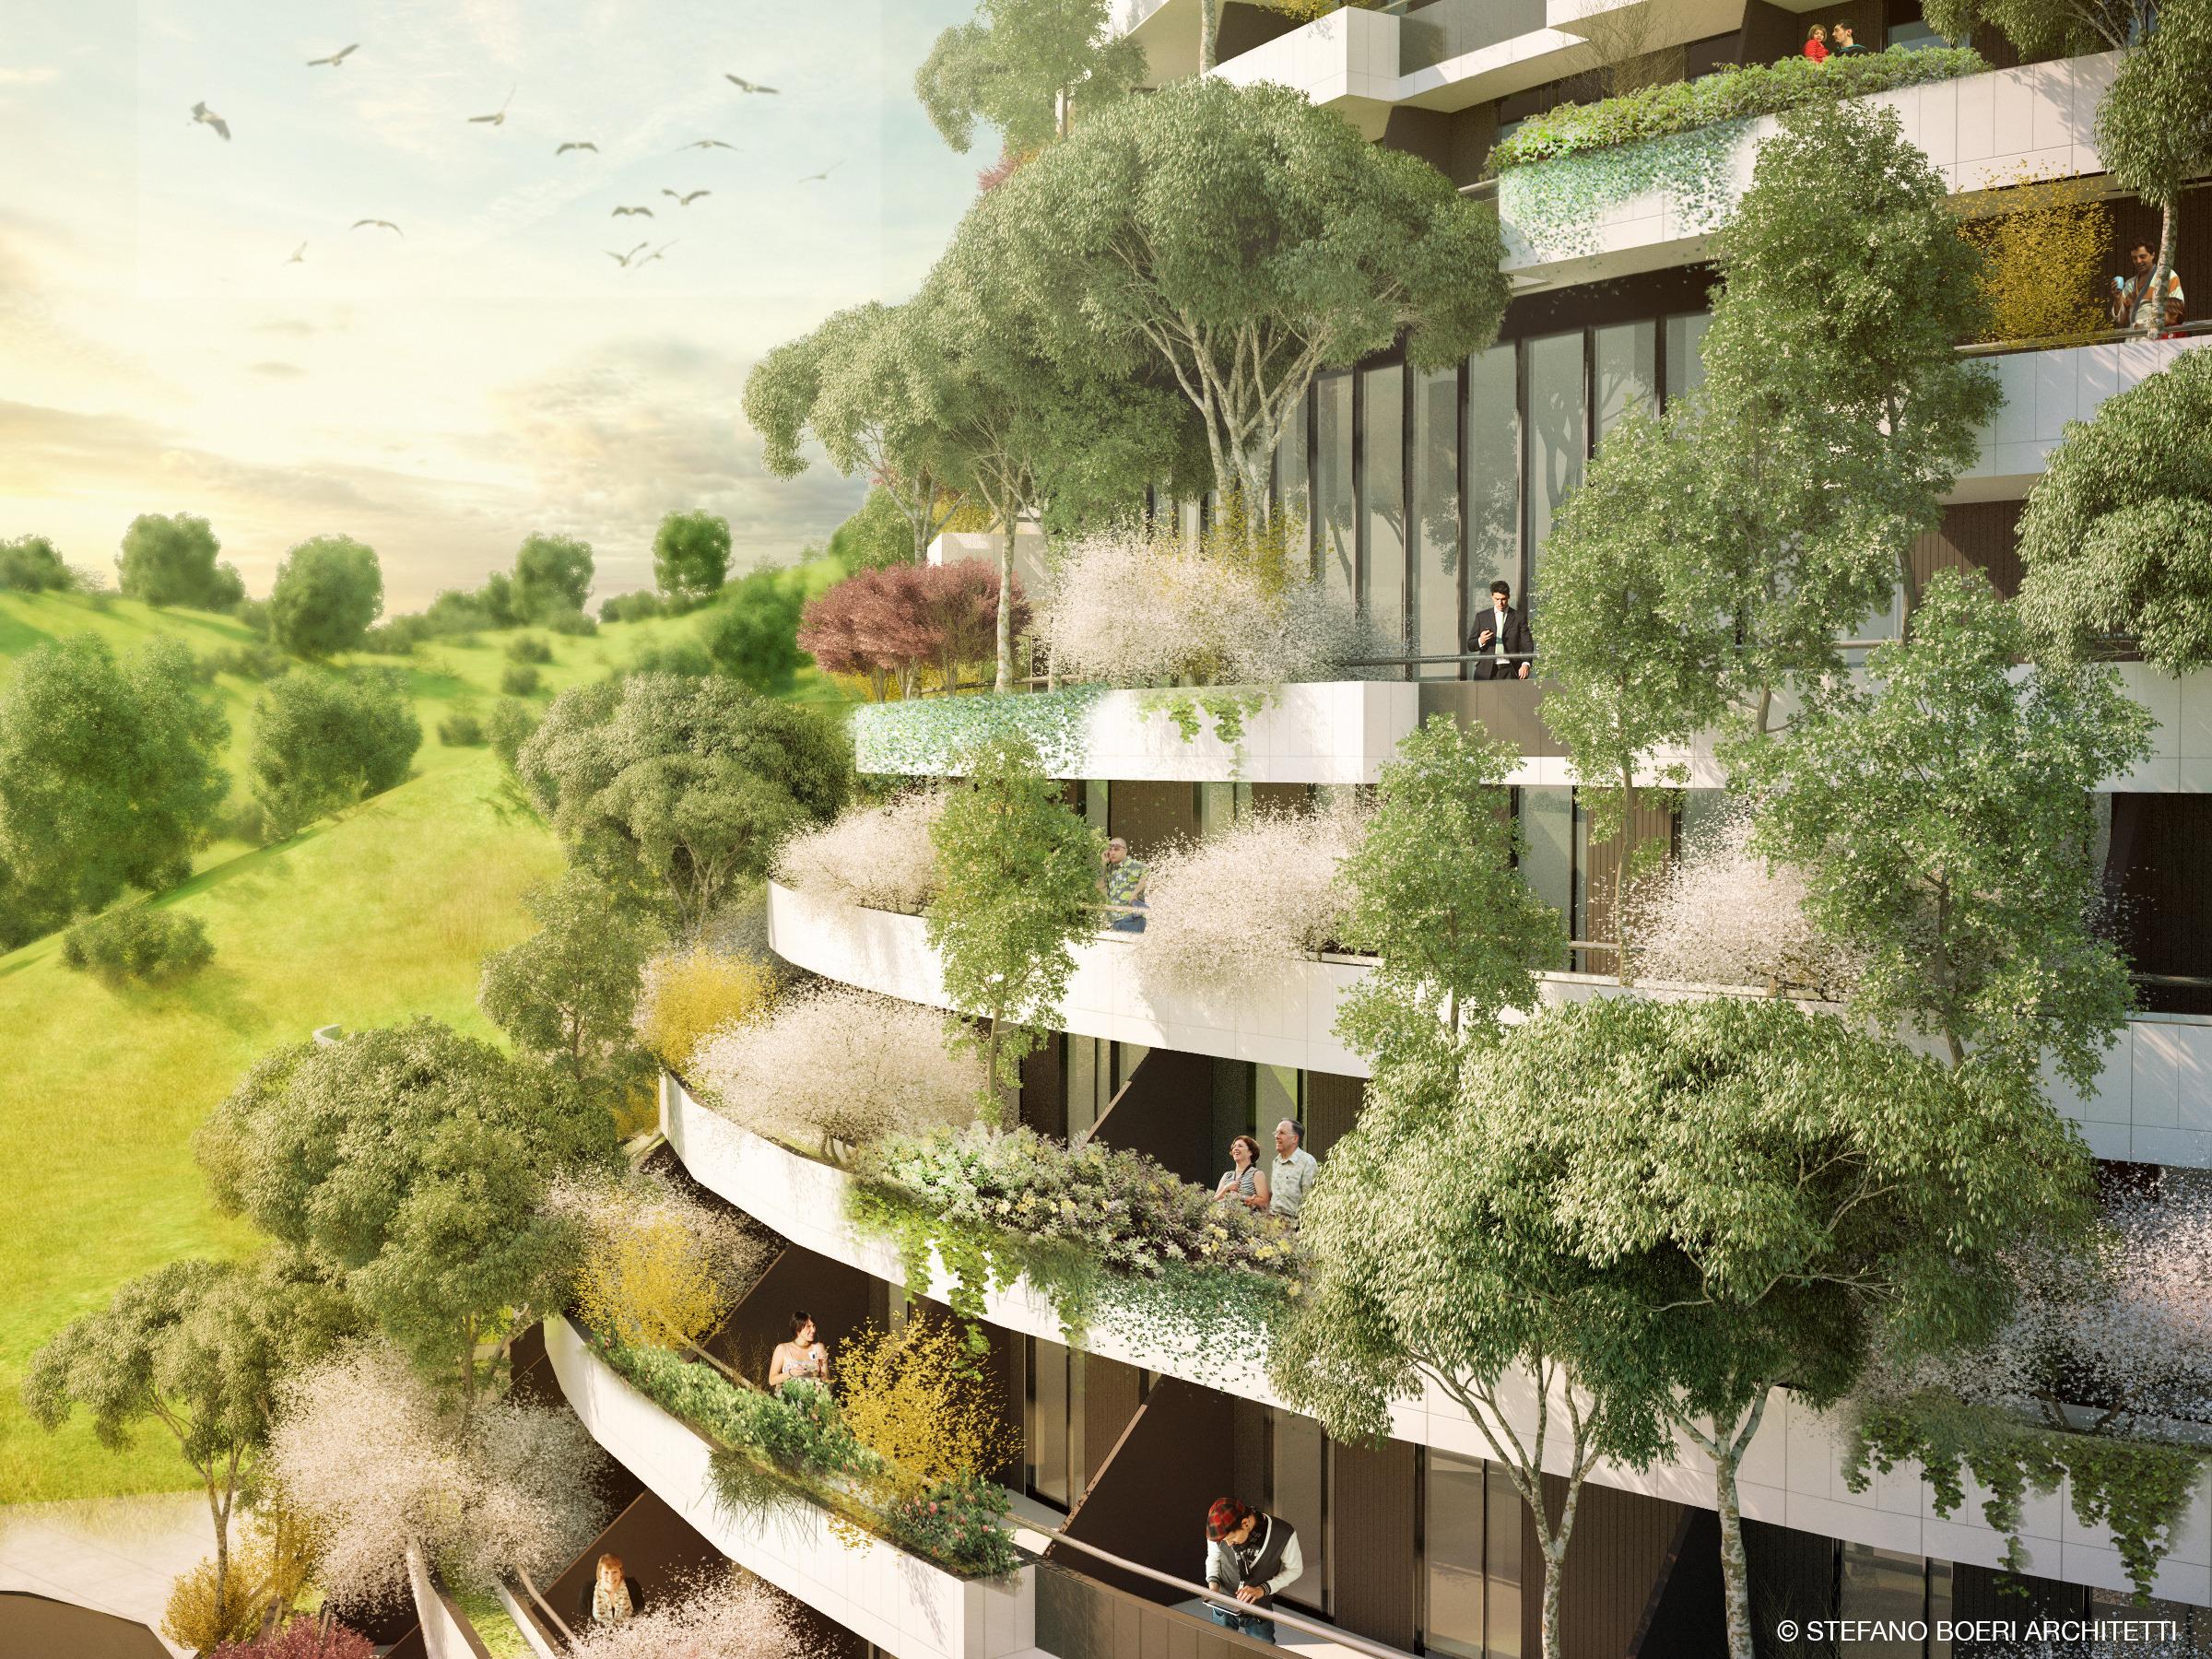 Architettura Sostenibile Architetti guizhou – mountain forest hotel | stefano boeri architetti